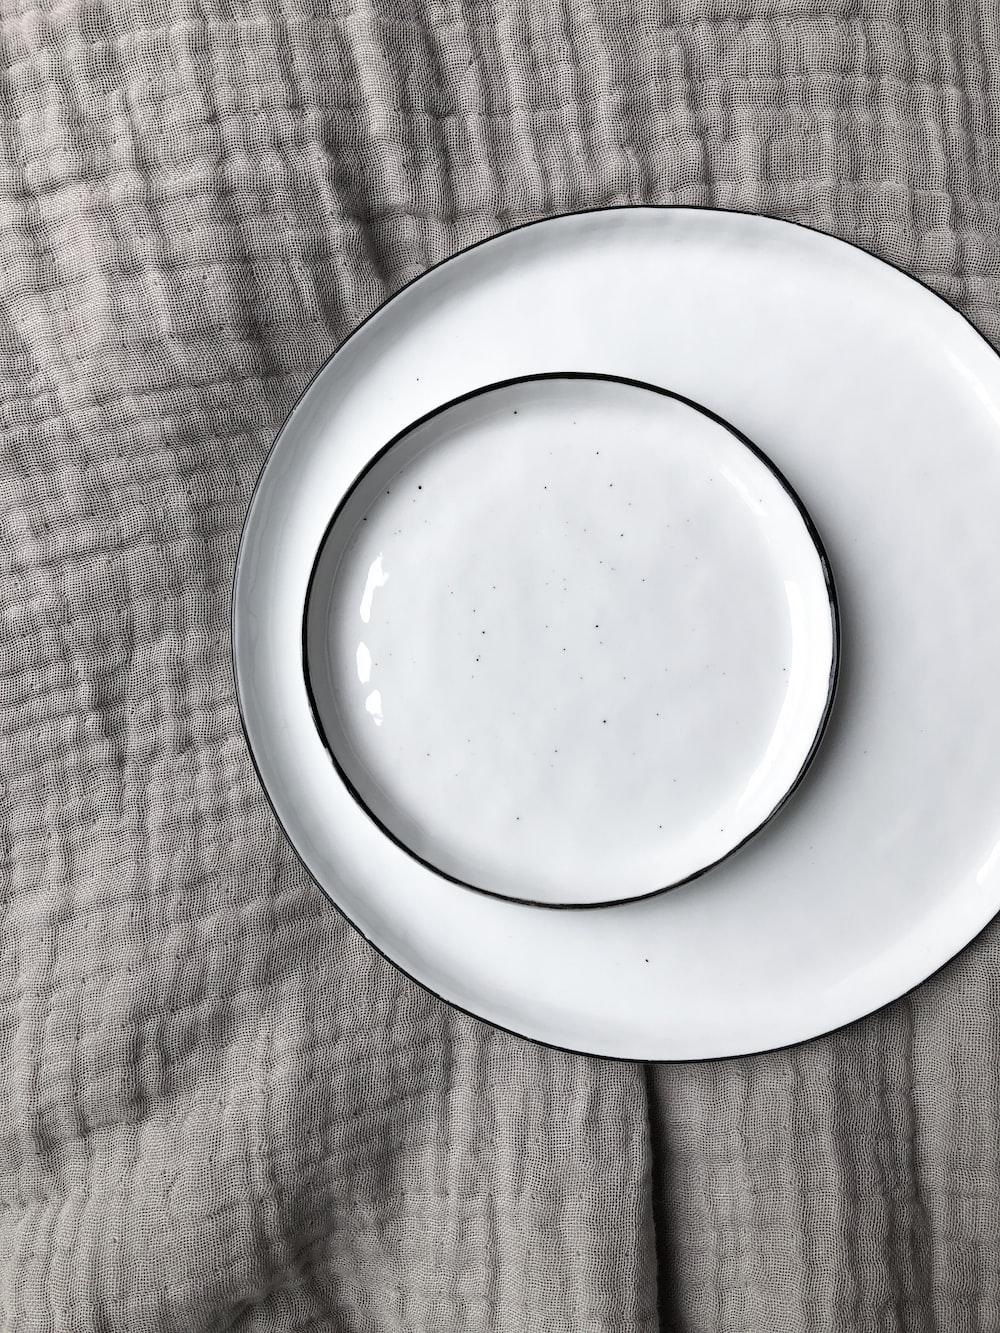 round white ceramic plate and saucer